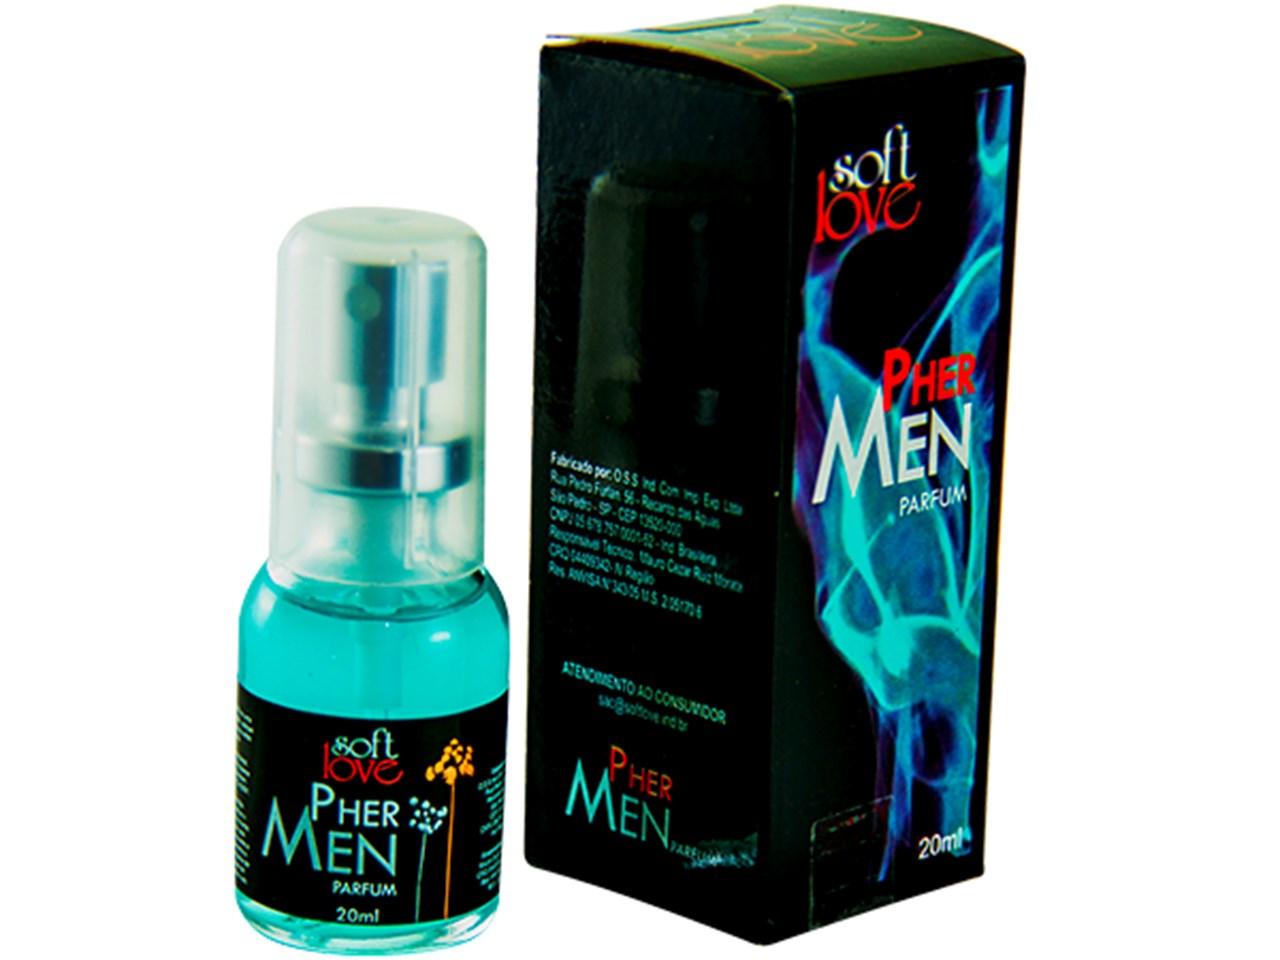 Perfume Afrodisíaco Pher Men Masculino 20 ml  - Soft Love